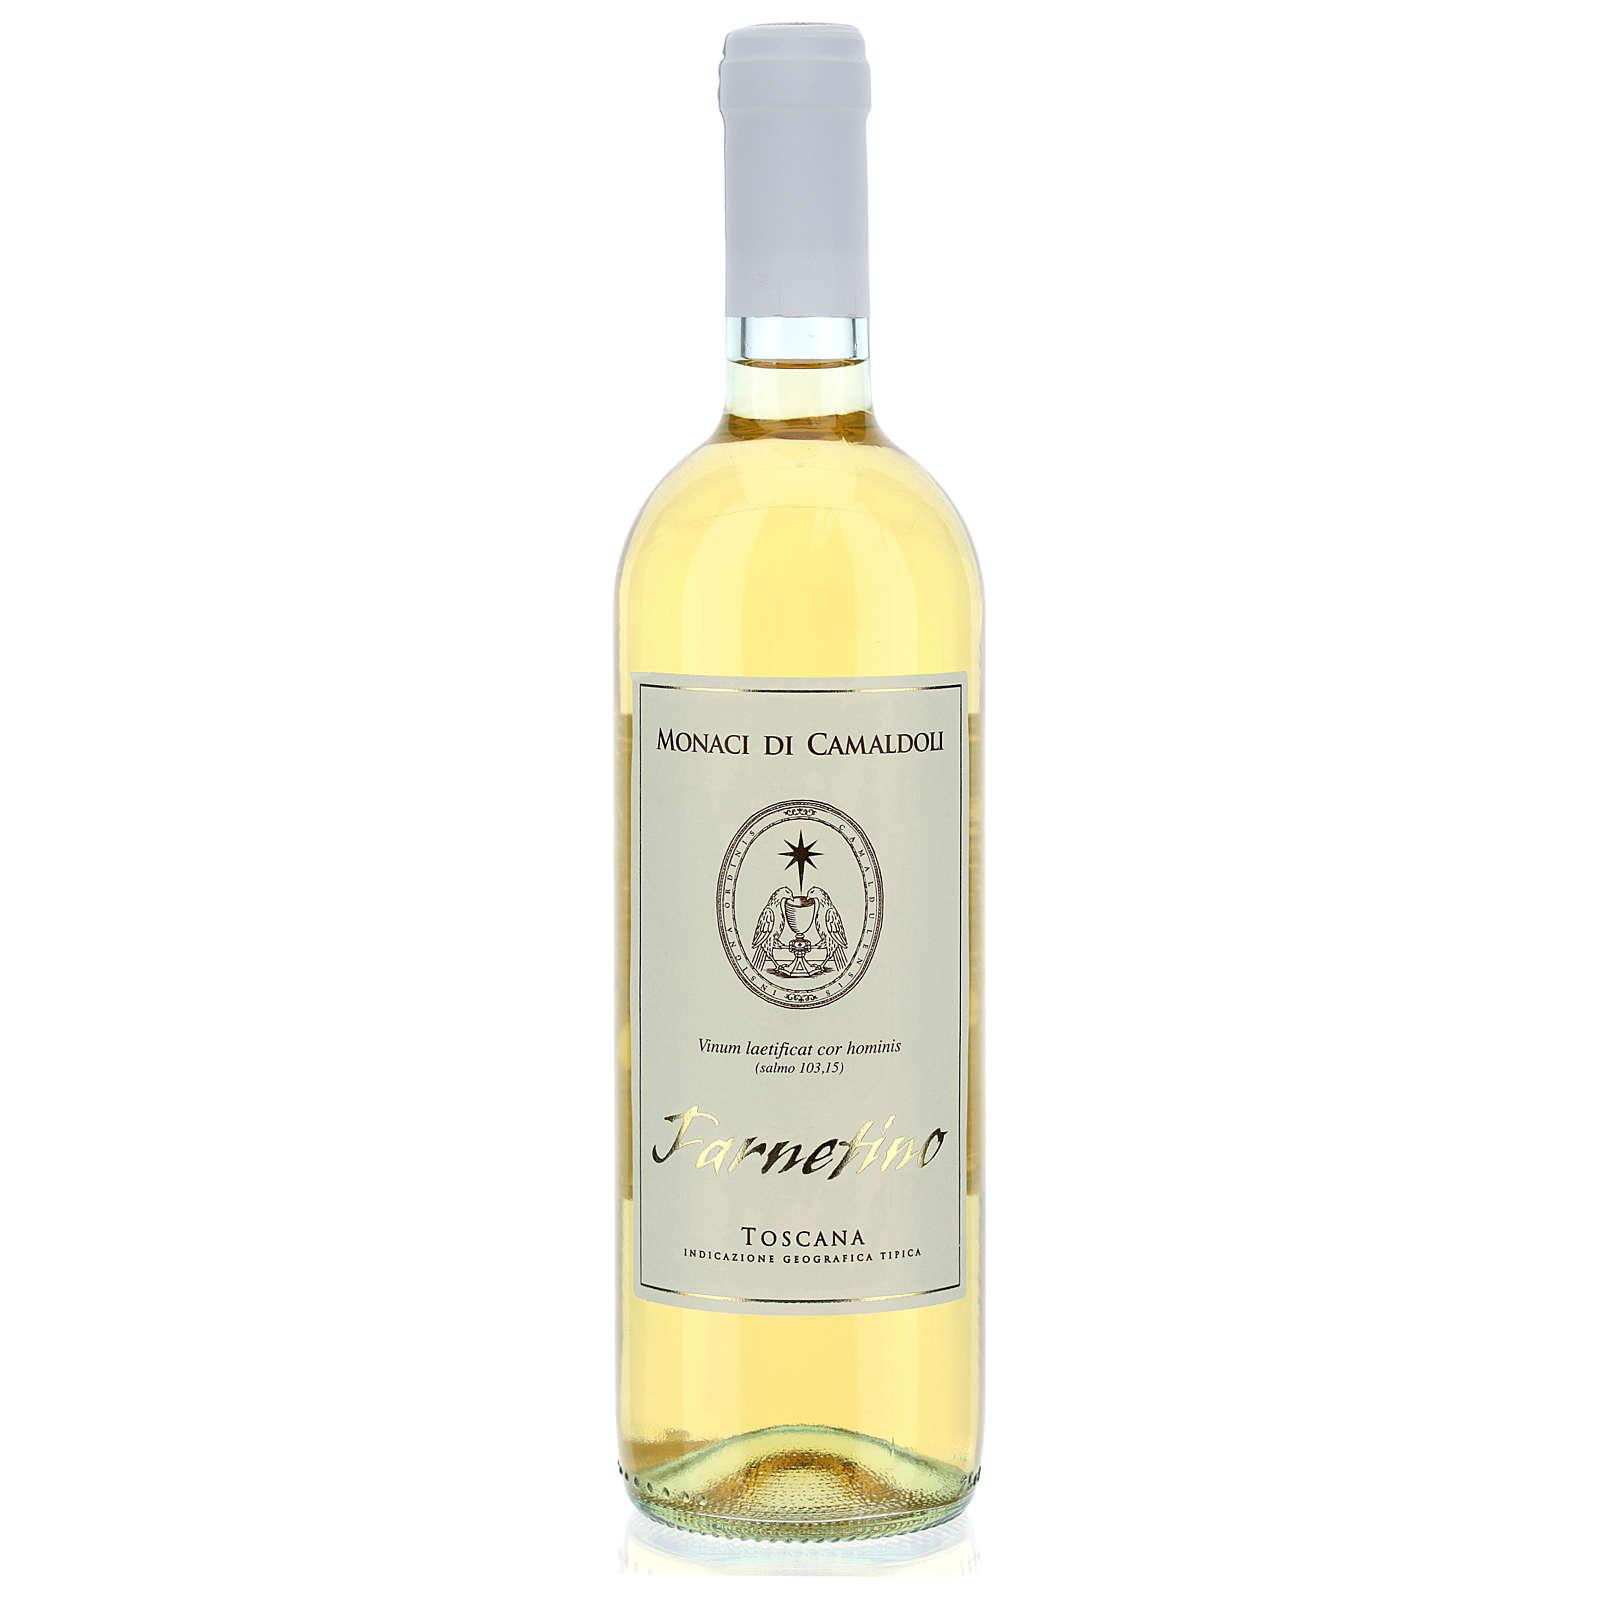 Weißwein, Toscana, Borbotto, 750 ml 3